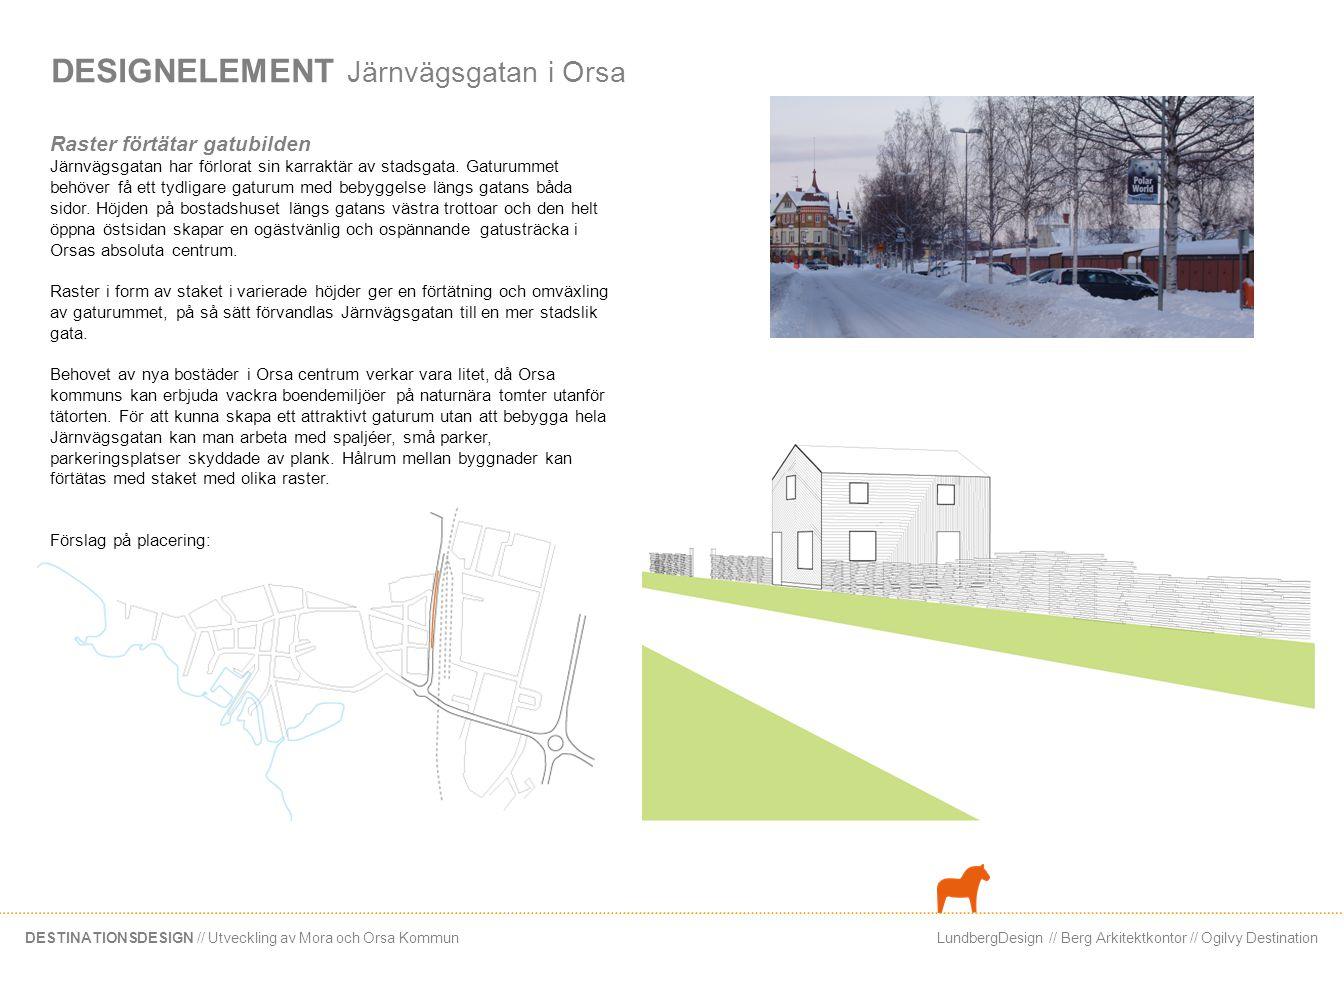 LundbergDesign // Berg Arkitektkontor // Ogilvy DestinationDESTINATIONSDESIGN // Utveckling av Mora och Orsa Kommun DESIGNELEMENT Järnvägsgatan i Orsa